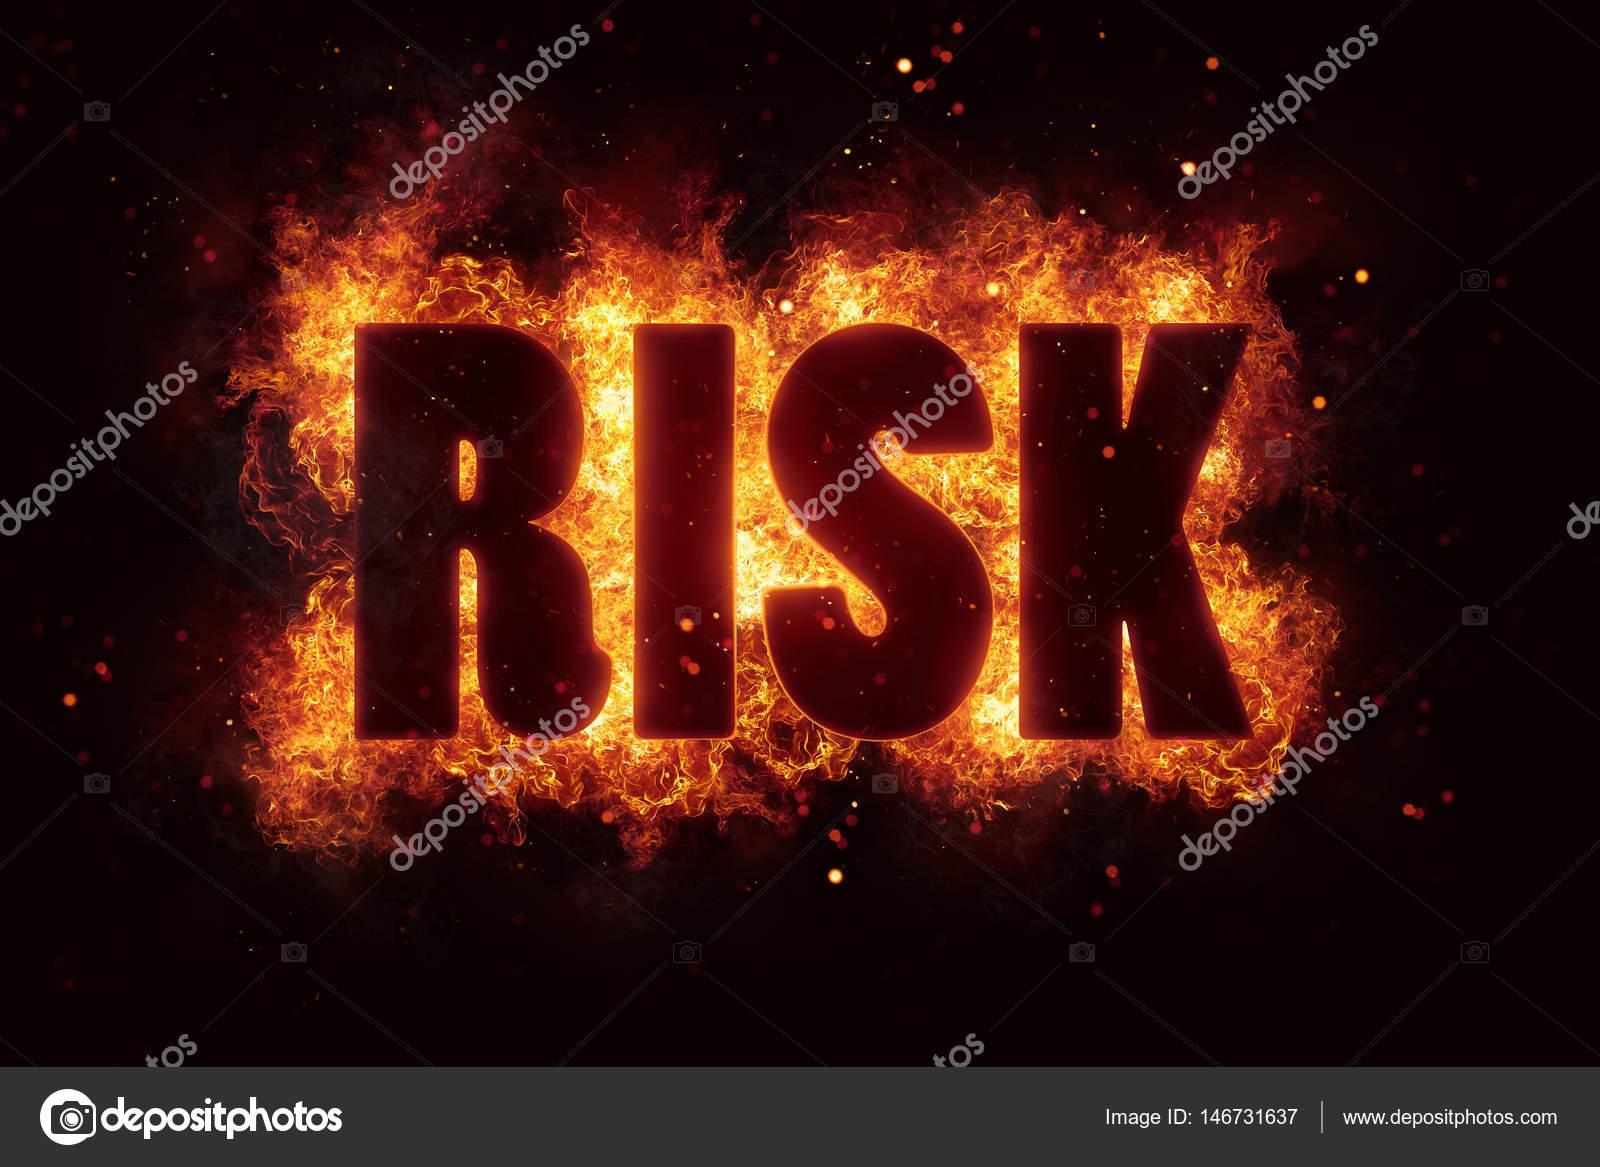 Risk text flame flames burn burning hot explosion stock photo risk text flame flames burn burning hot explosion stock photo buycottarizona